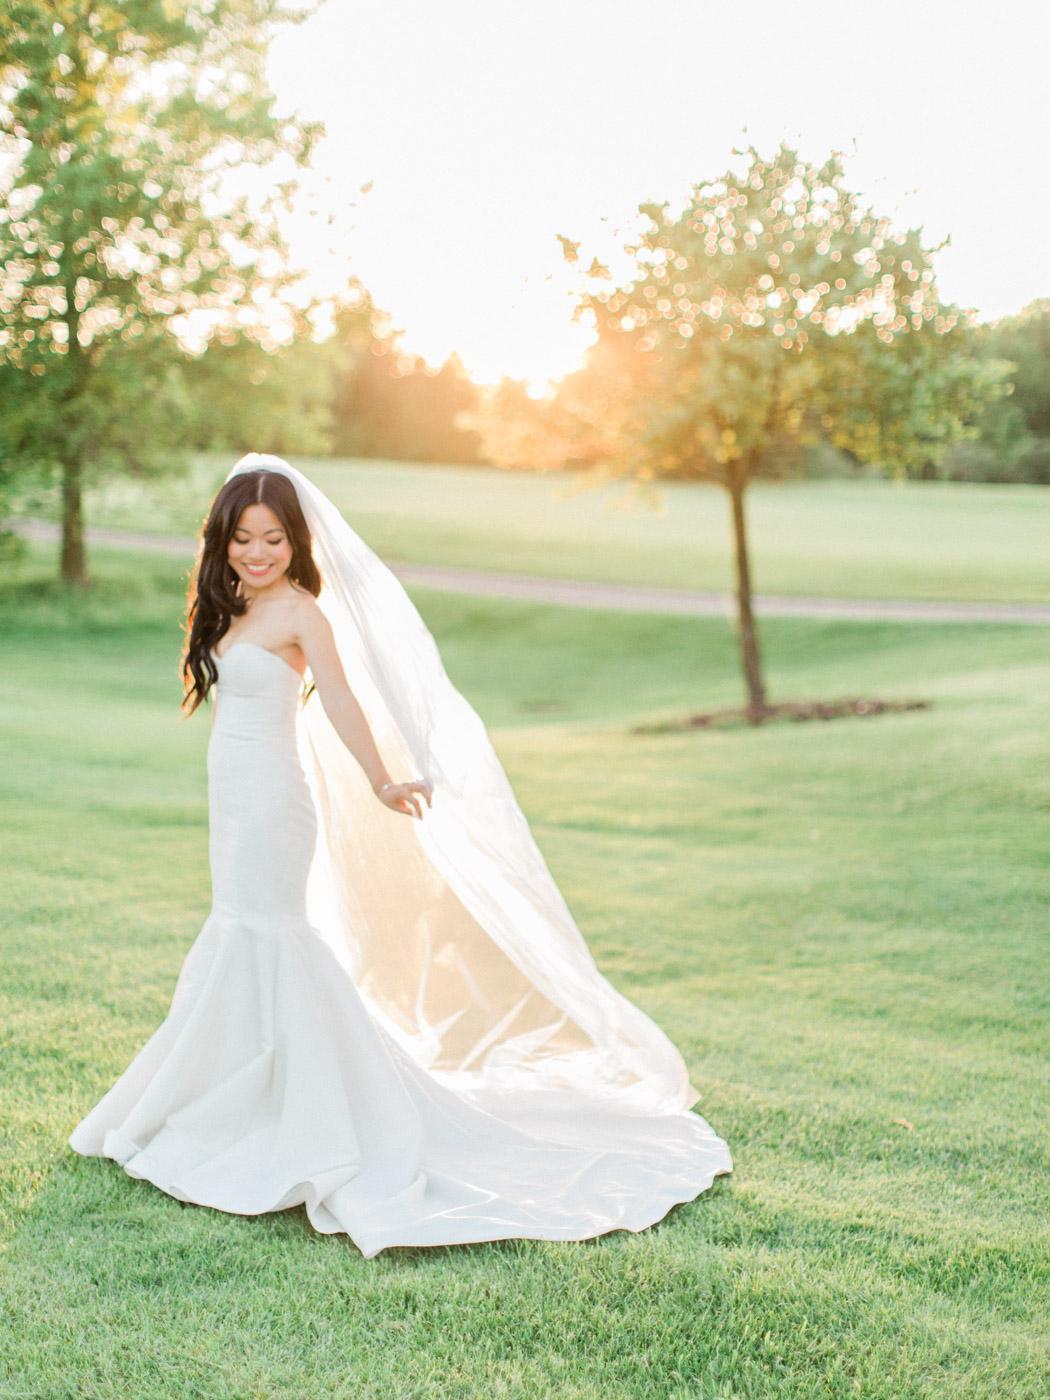 Toronto-Collingwood-Muskoka-Wedding-photographer-ideal-wedding-day-photography-timeline6.jpg